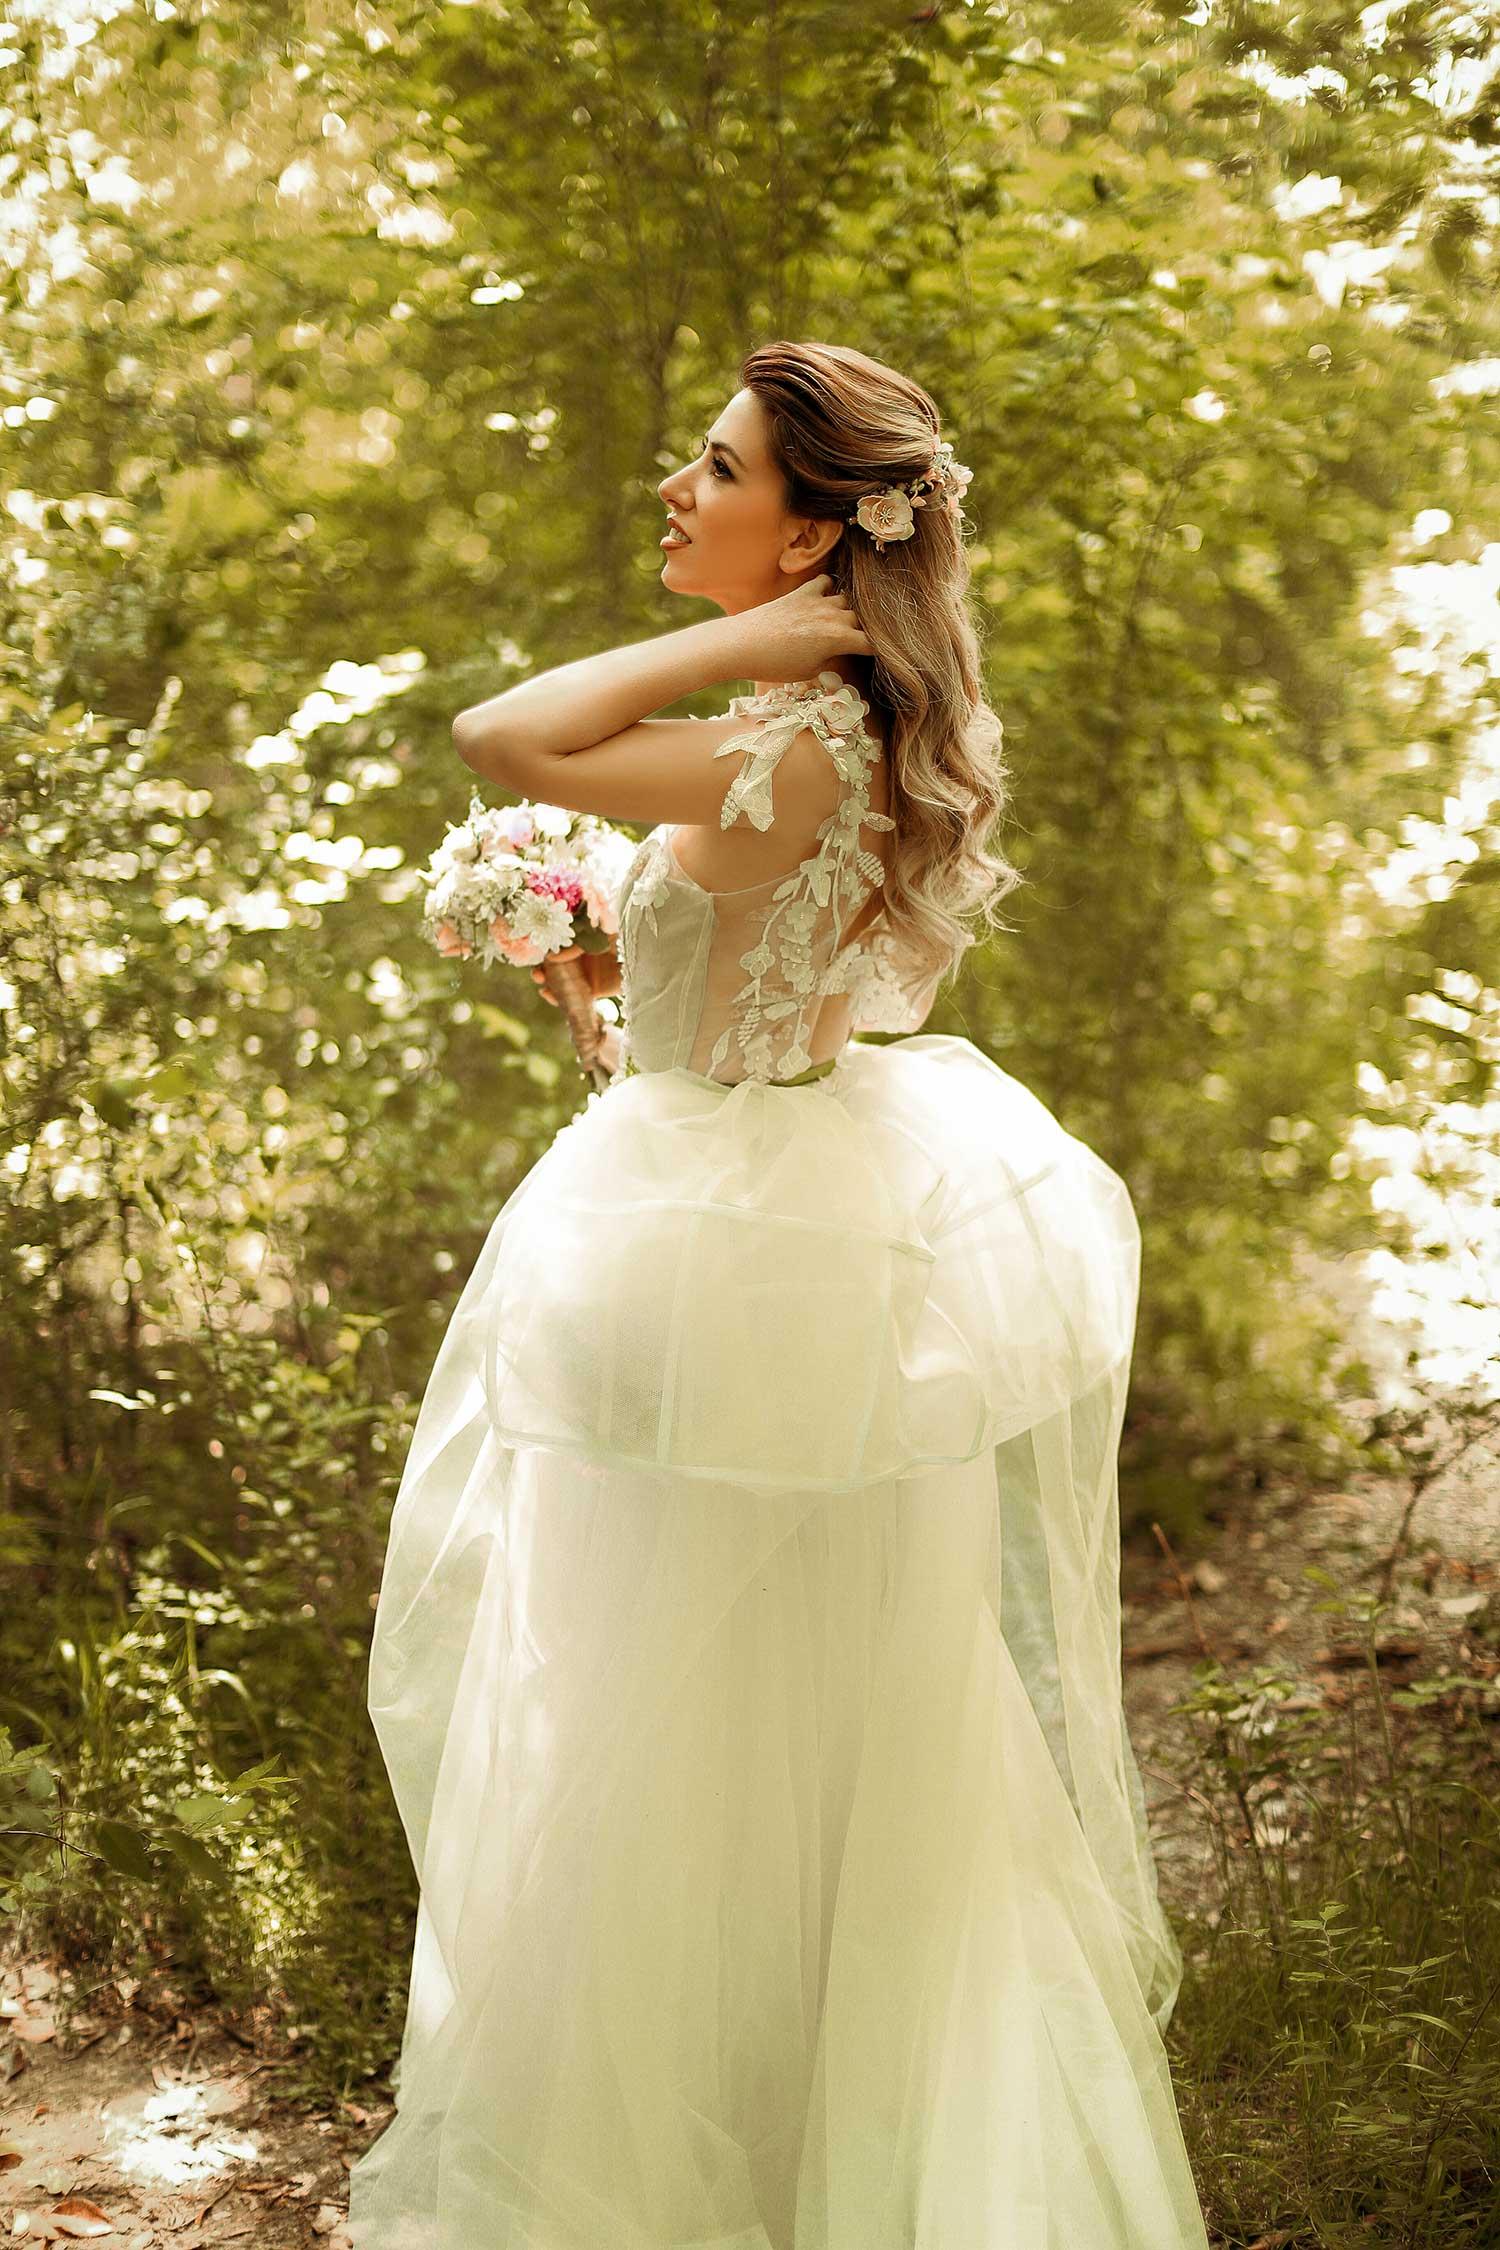 Fairy tale wedding photoshoot